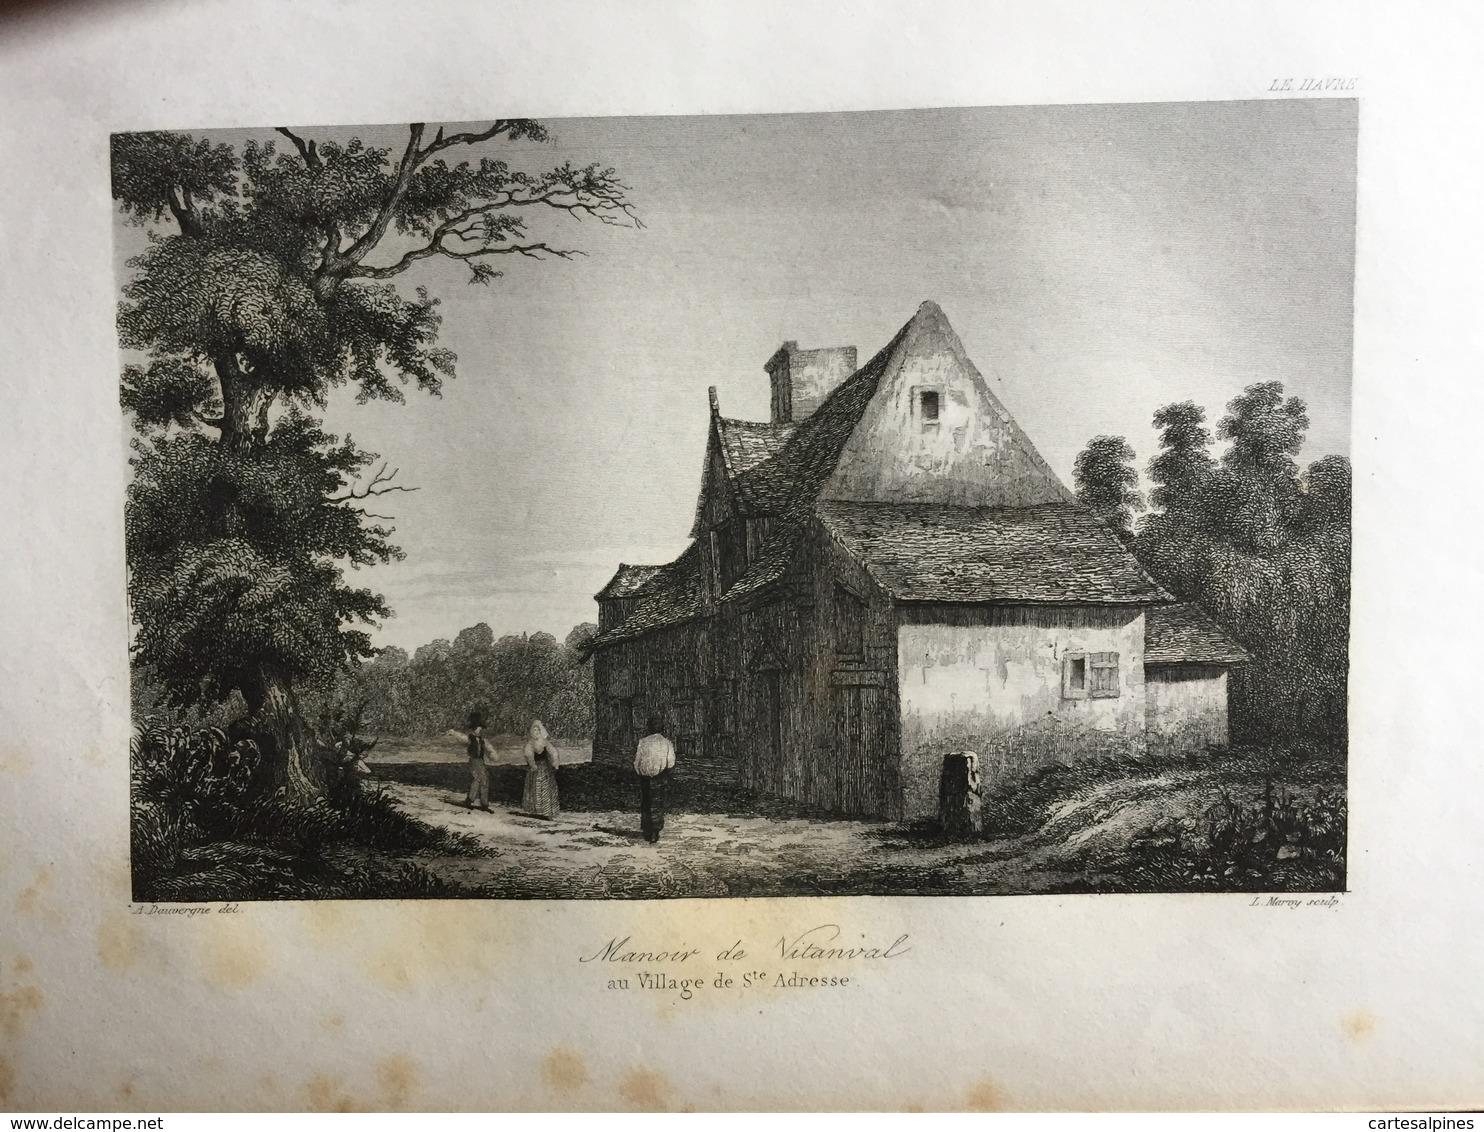 (Normandie) Sainte Adresse: Manoir De Vitanval. Gravure Sur Acier De 1840. - Normandie